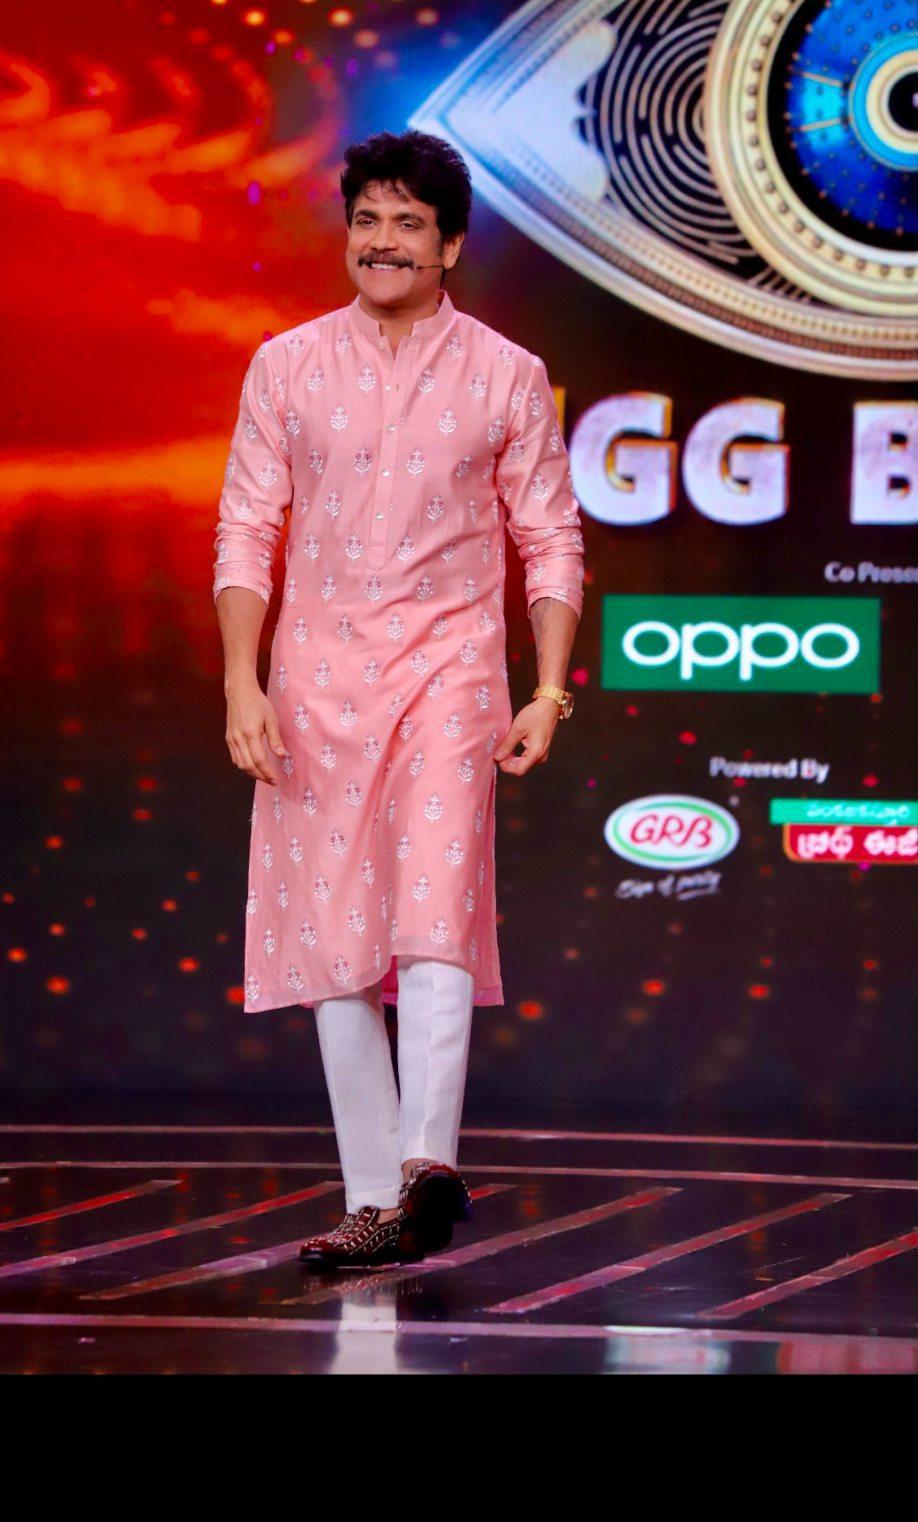 Nagarjuna Akkineni in anita dongre kurta suit for big boss telugu diwali